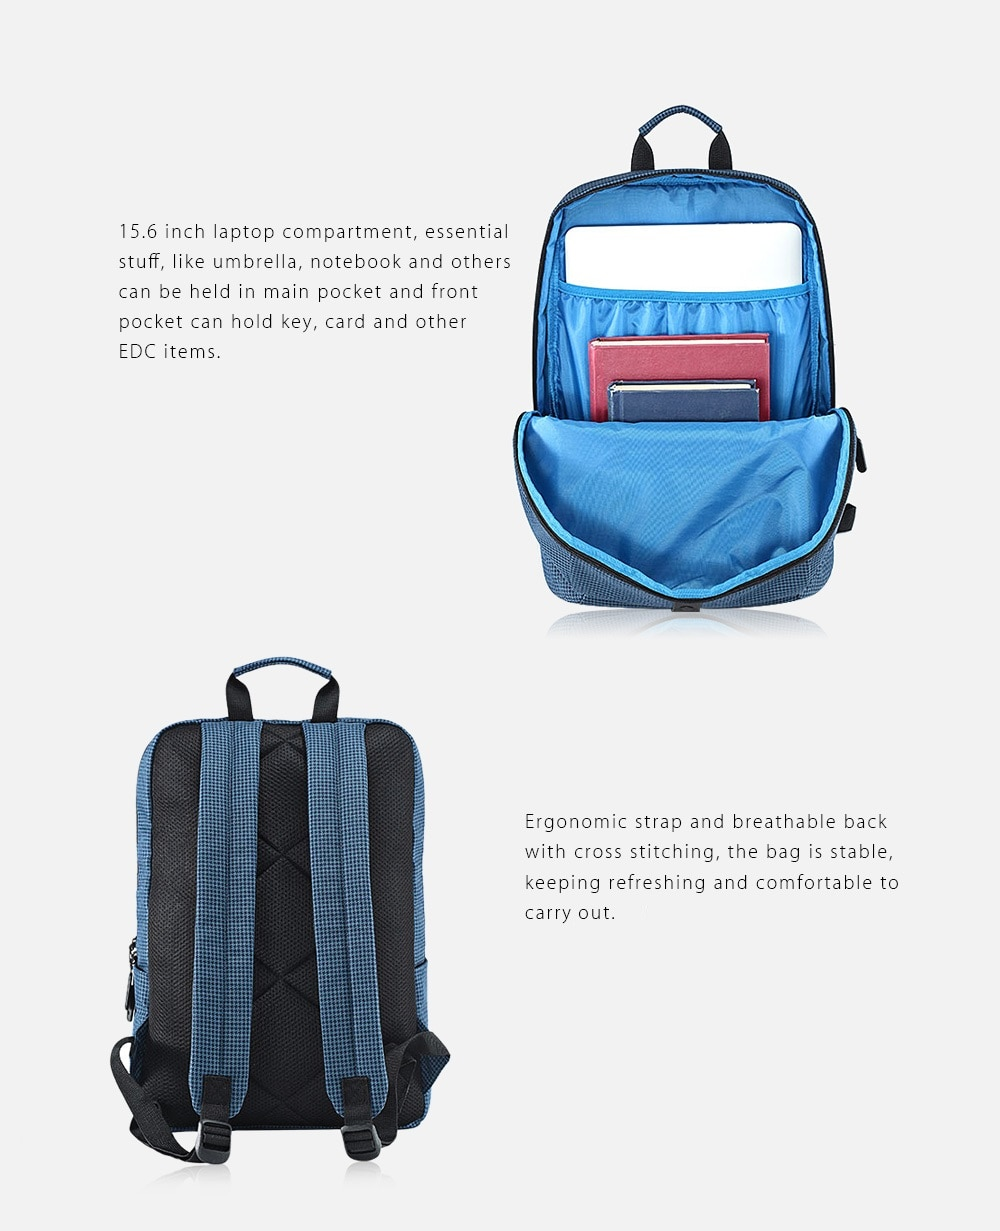 xiaomi_20l_leisure_backpack_2.jpg